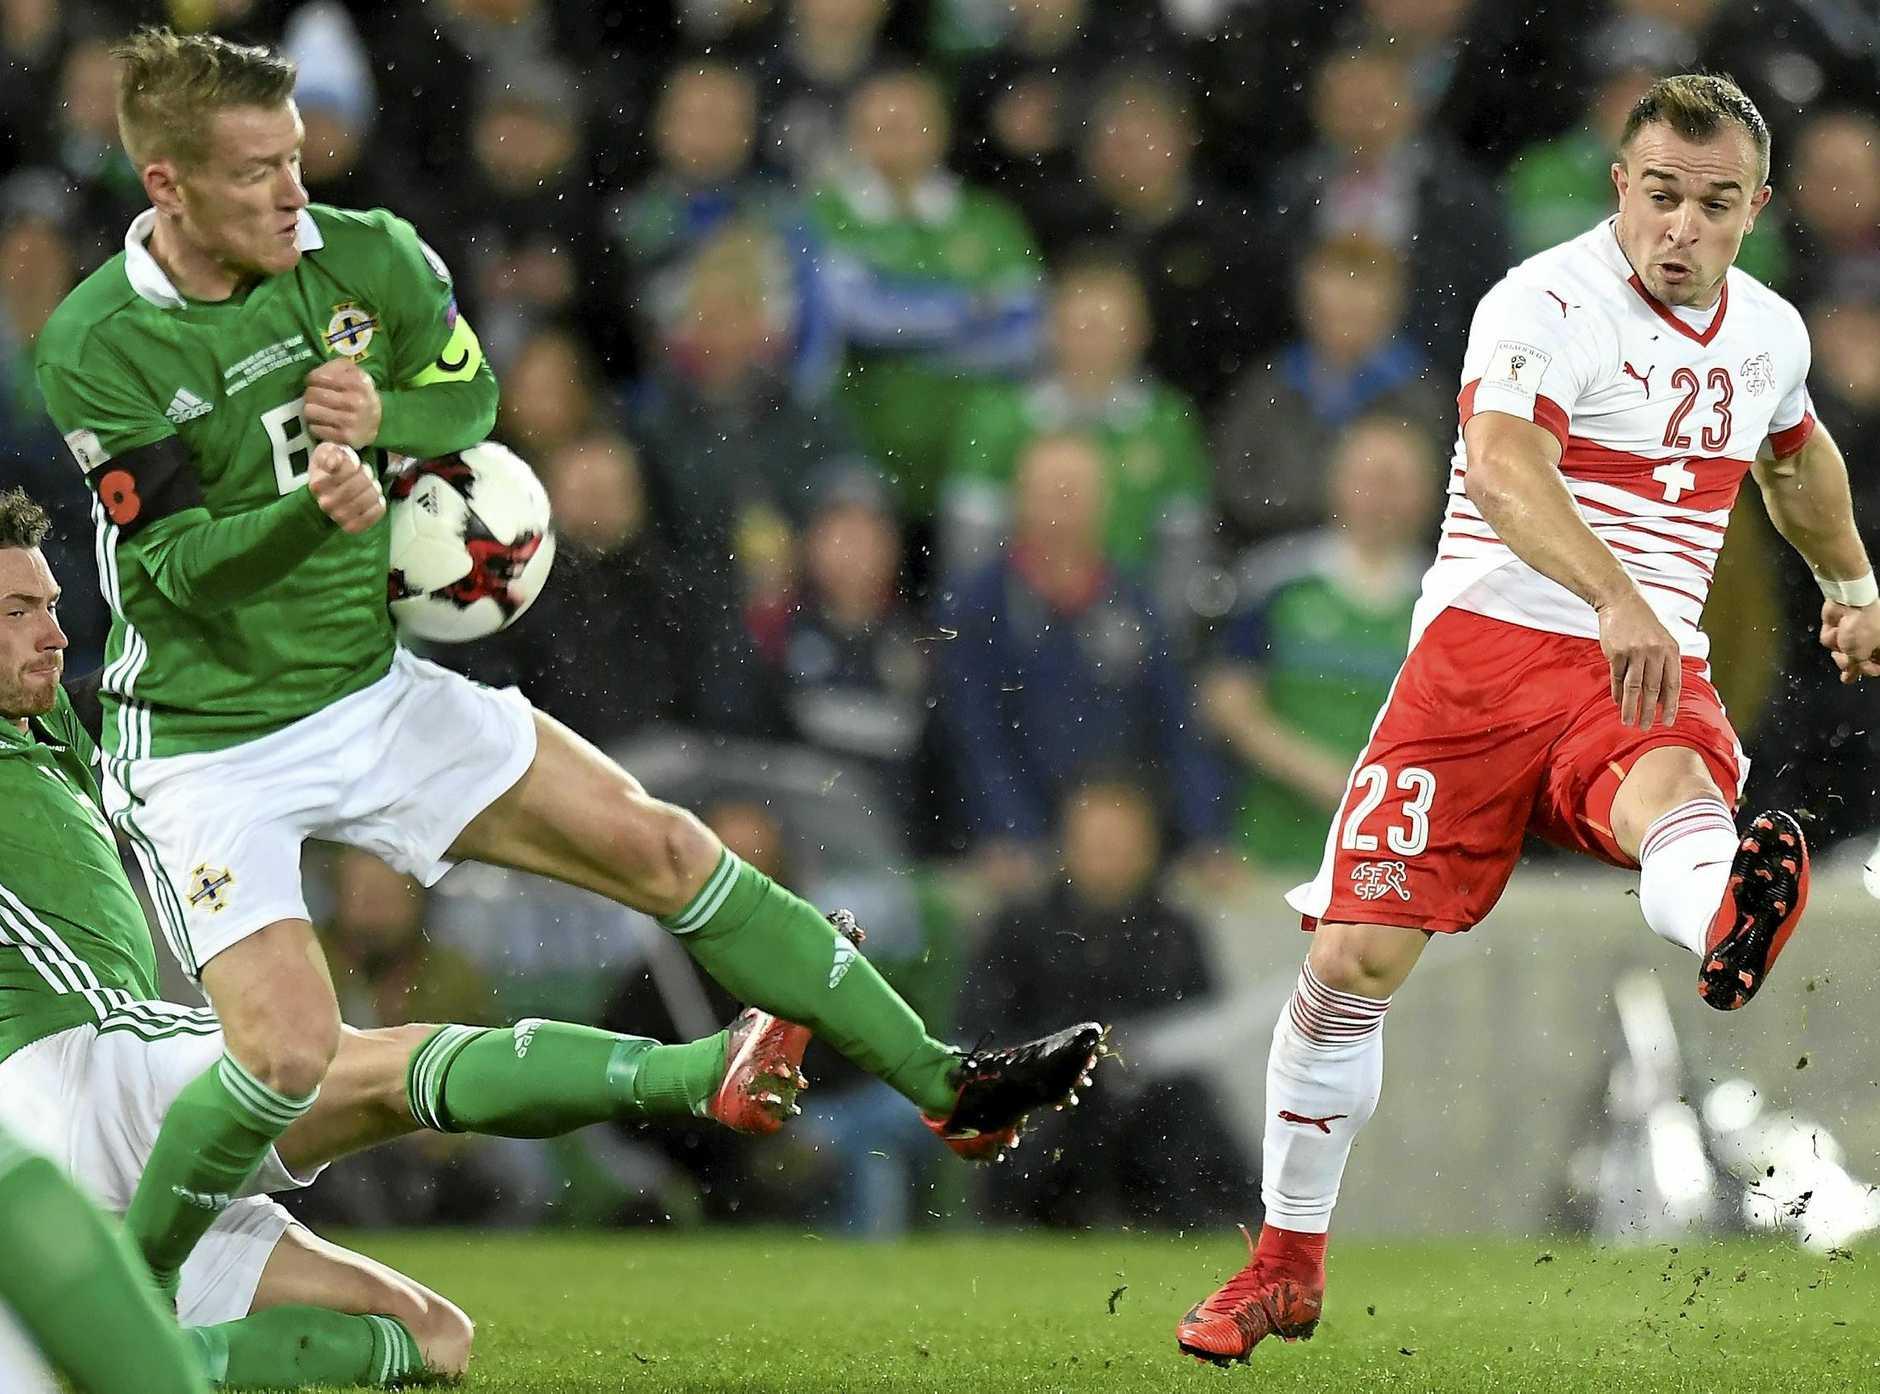 Northern Ireland midfielder Steven Davis (left) fights for the ball with Switzerland midfielder Xherdan Shaqiri.